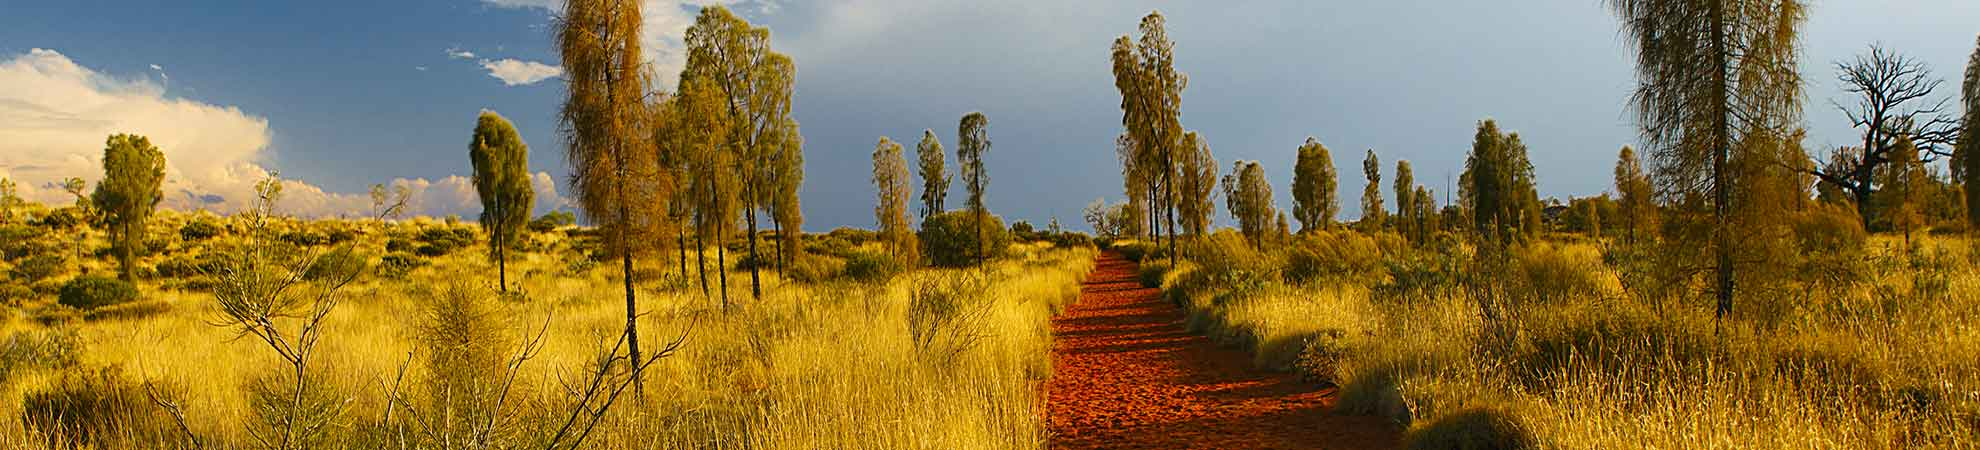 Visiter le Parc National d'Uluru